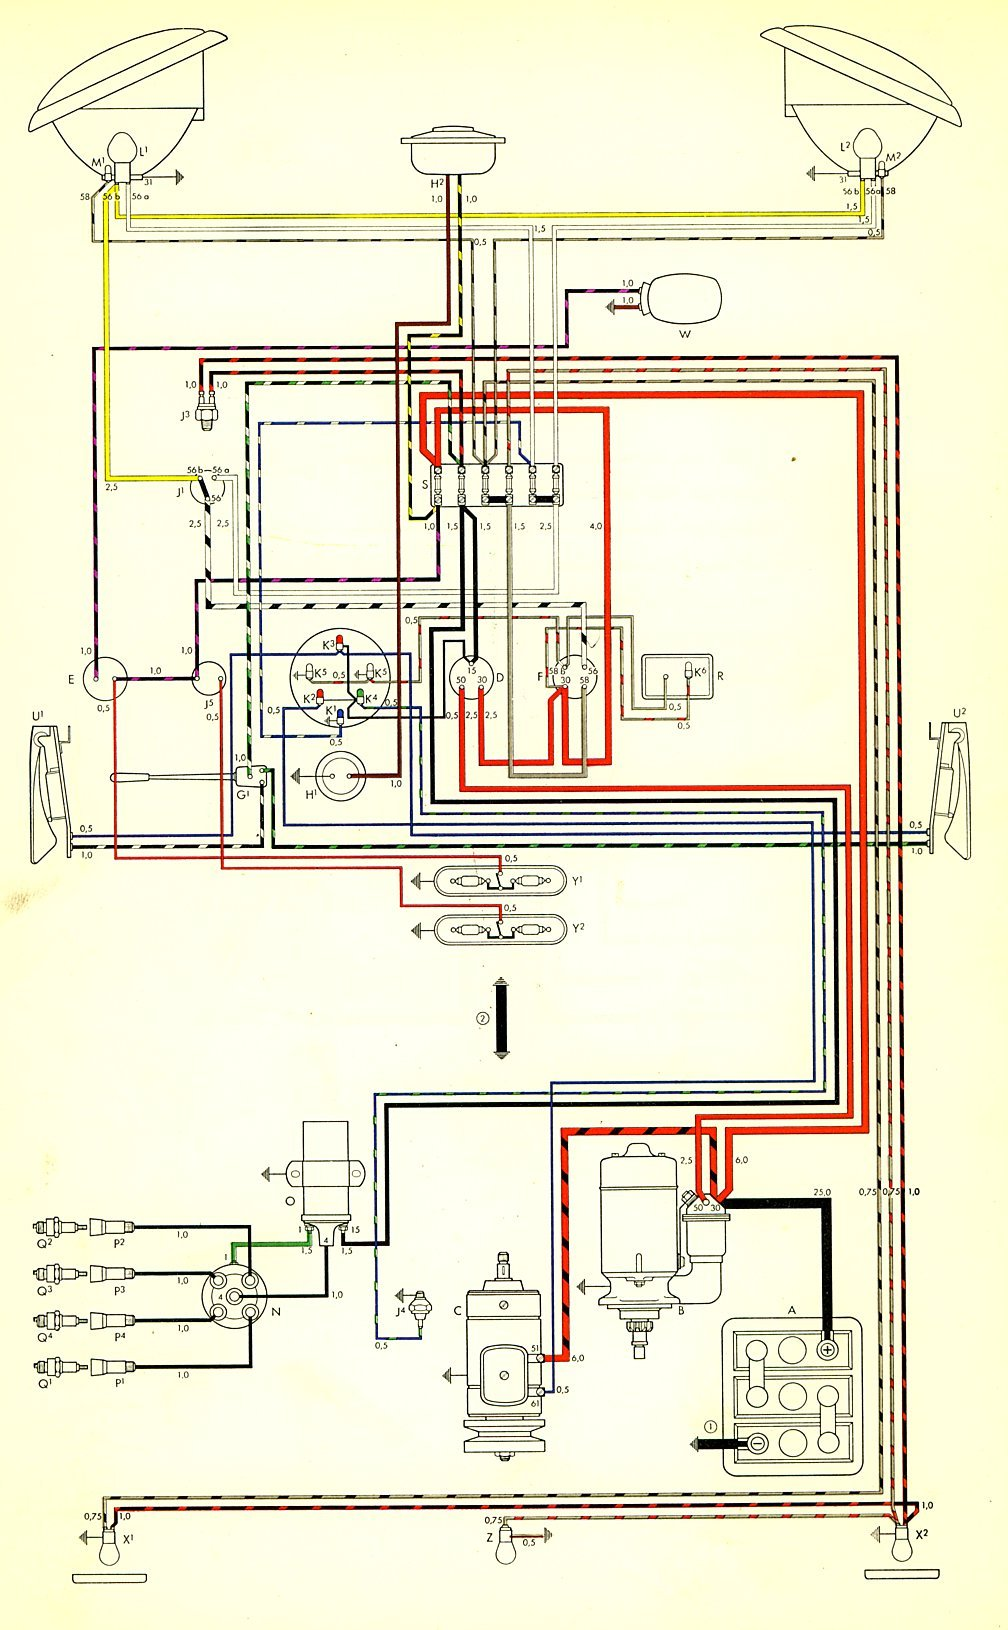 1977 Chevy Alternator Wiring Diagram 1959 Bus Wiring Diagram Thegoldenbug Com